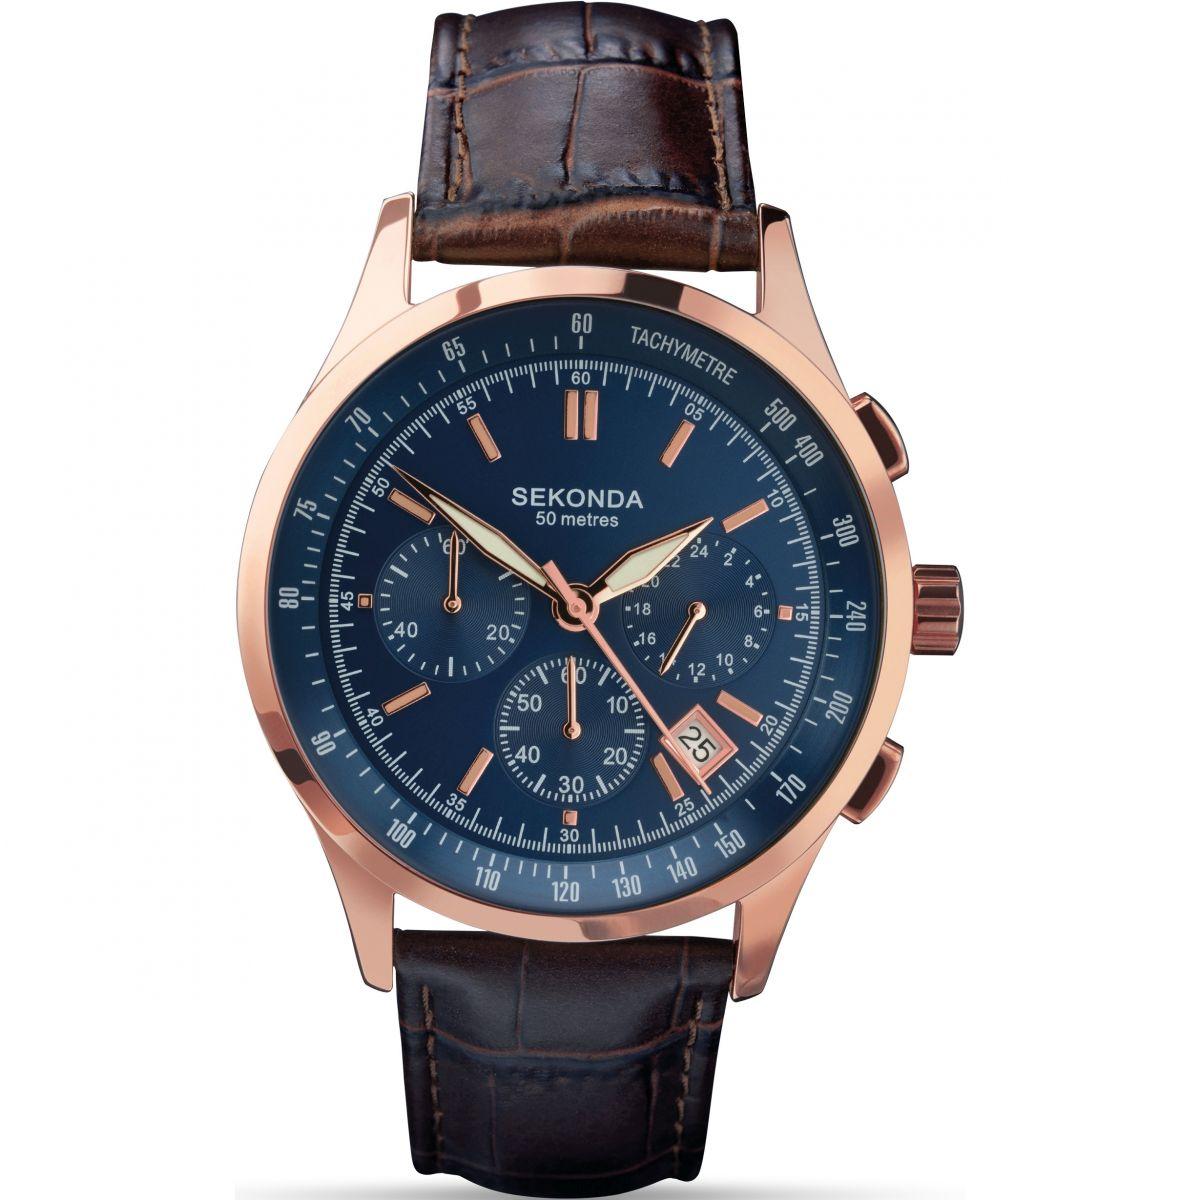 Gents sekonda chronograph watch 1157 for Sekonda watches